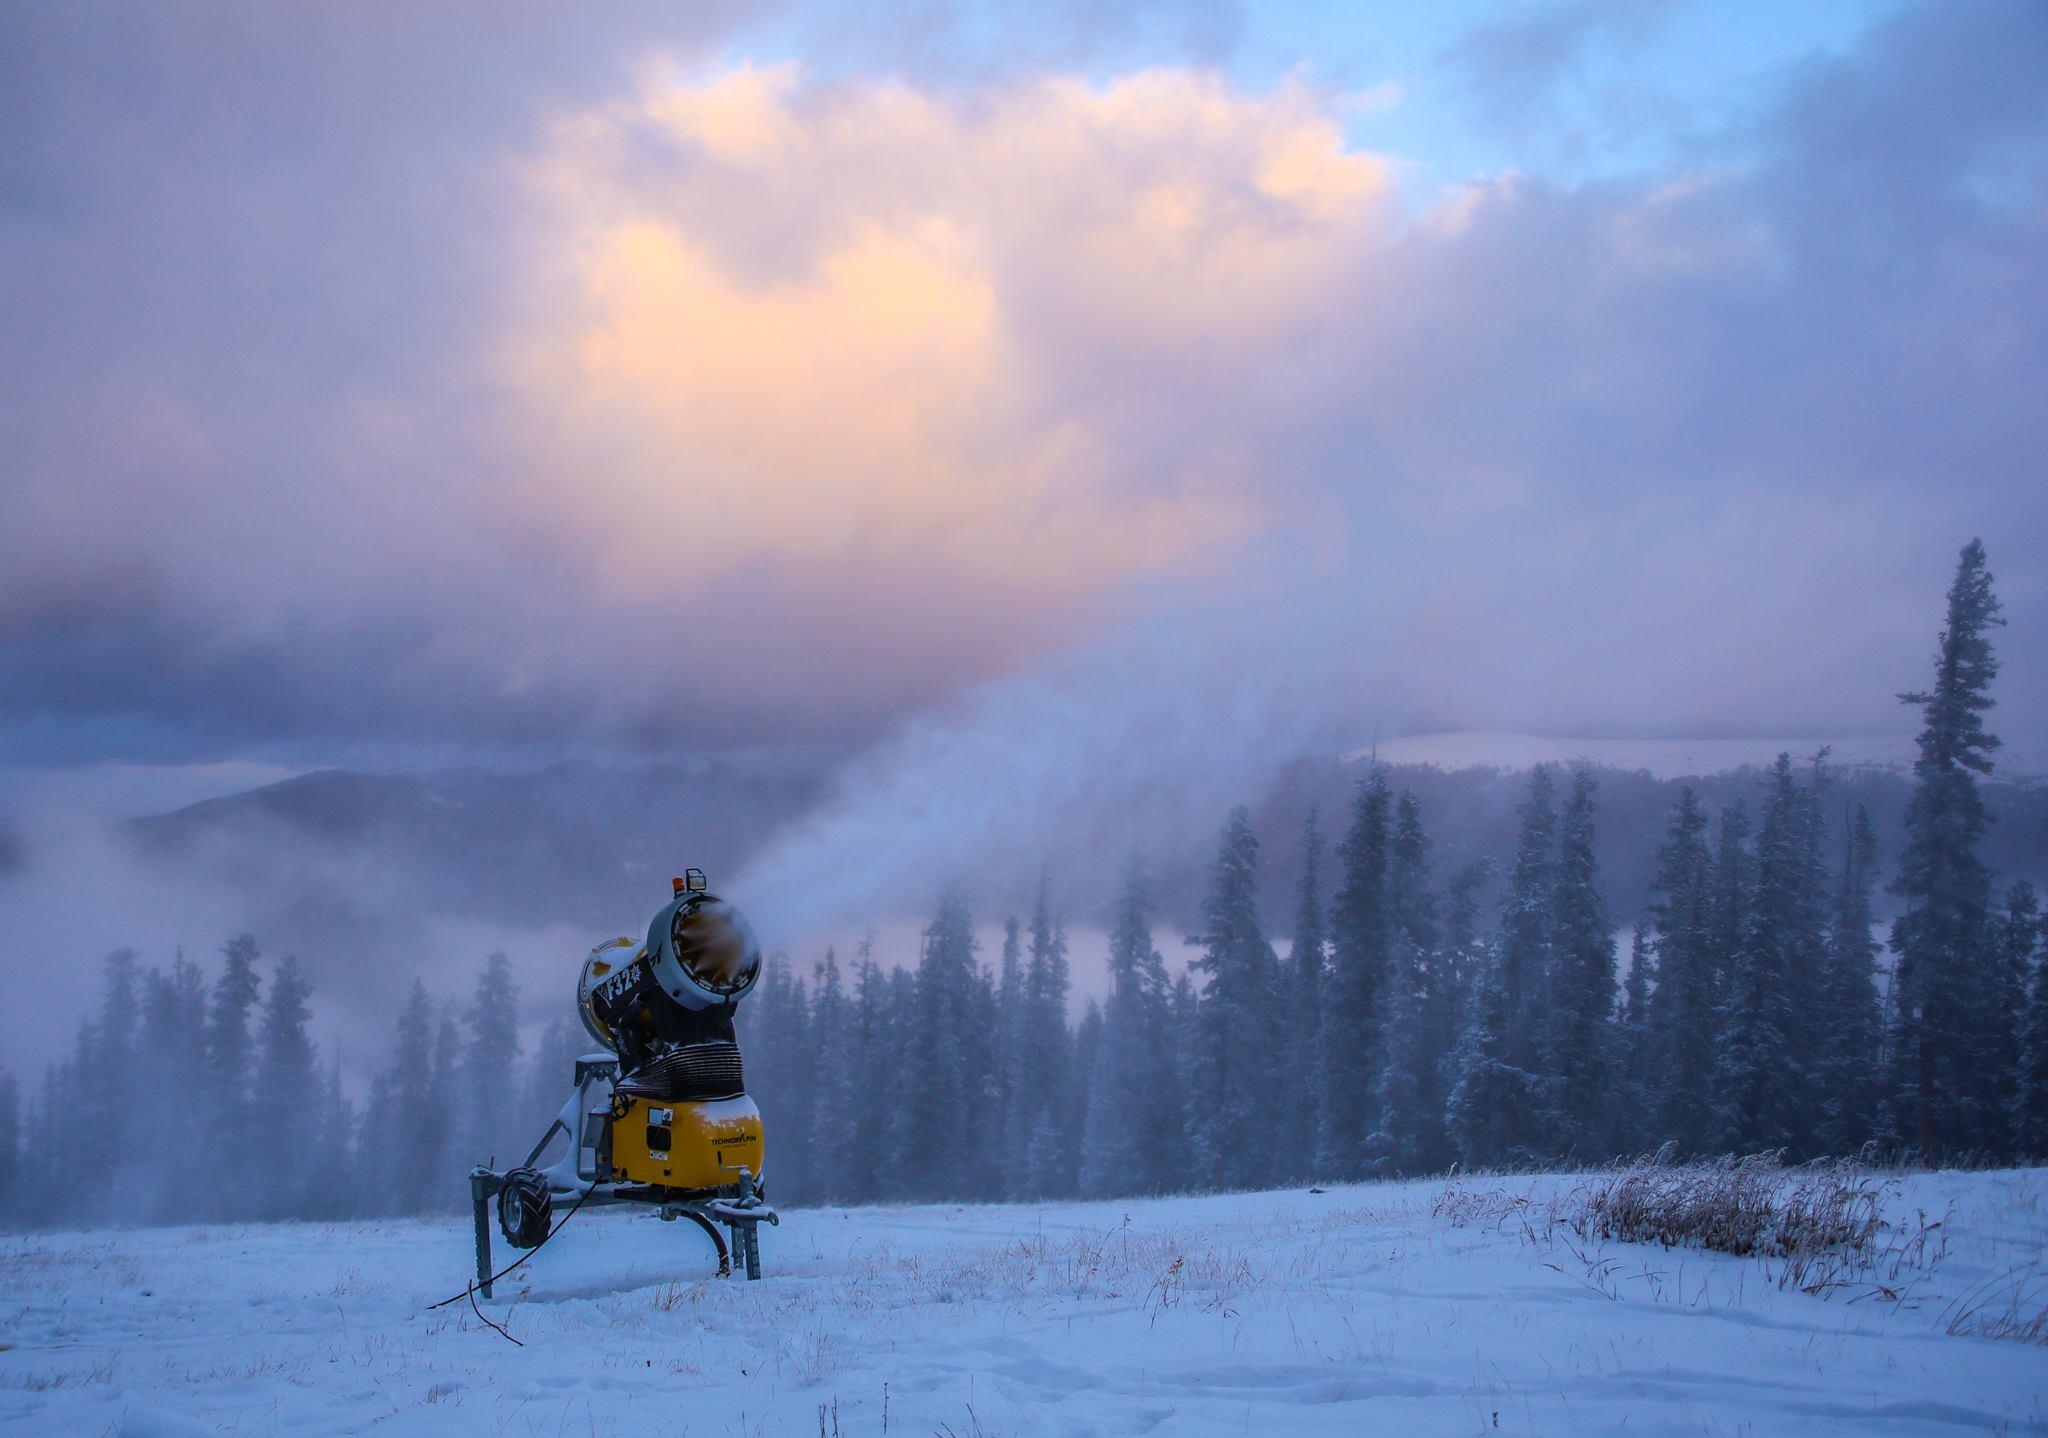 keystone snowmaking, keystone new snow, keystone opening